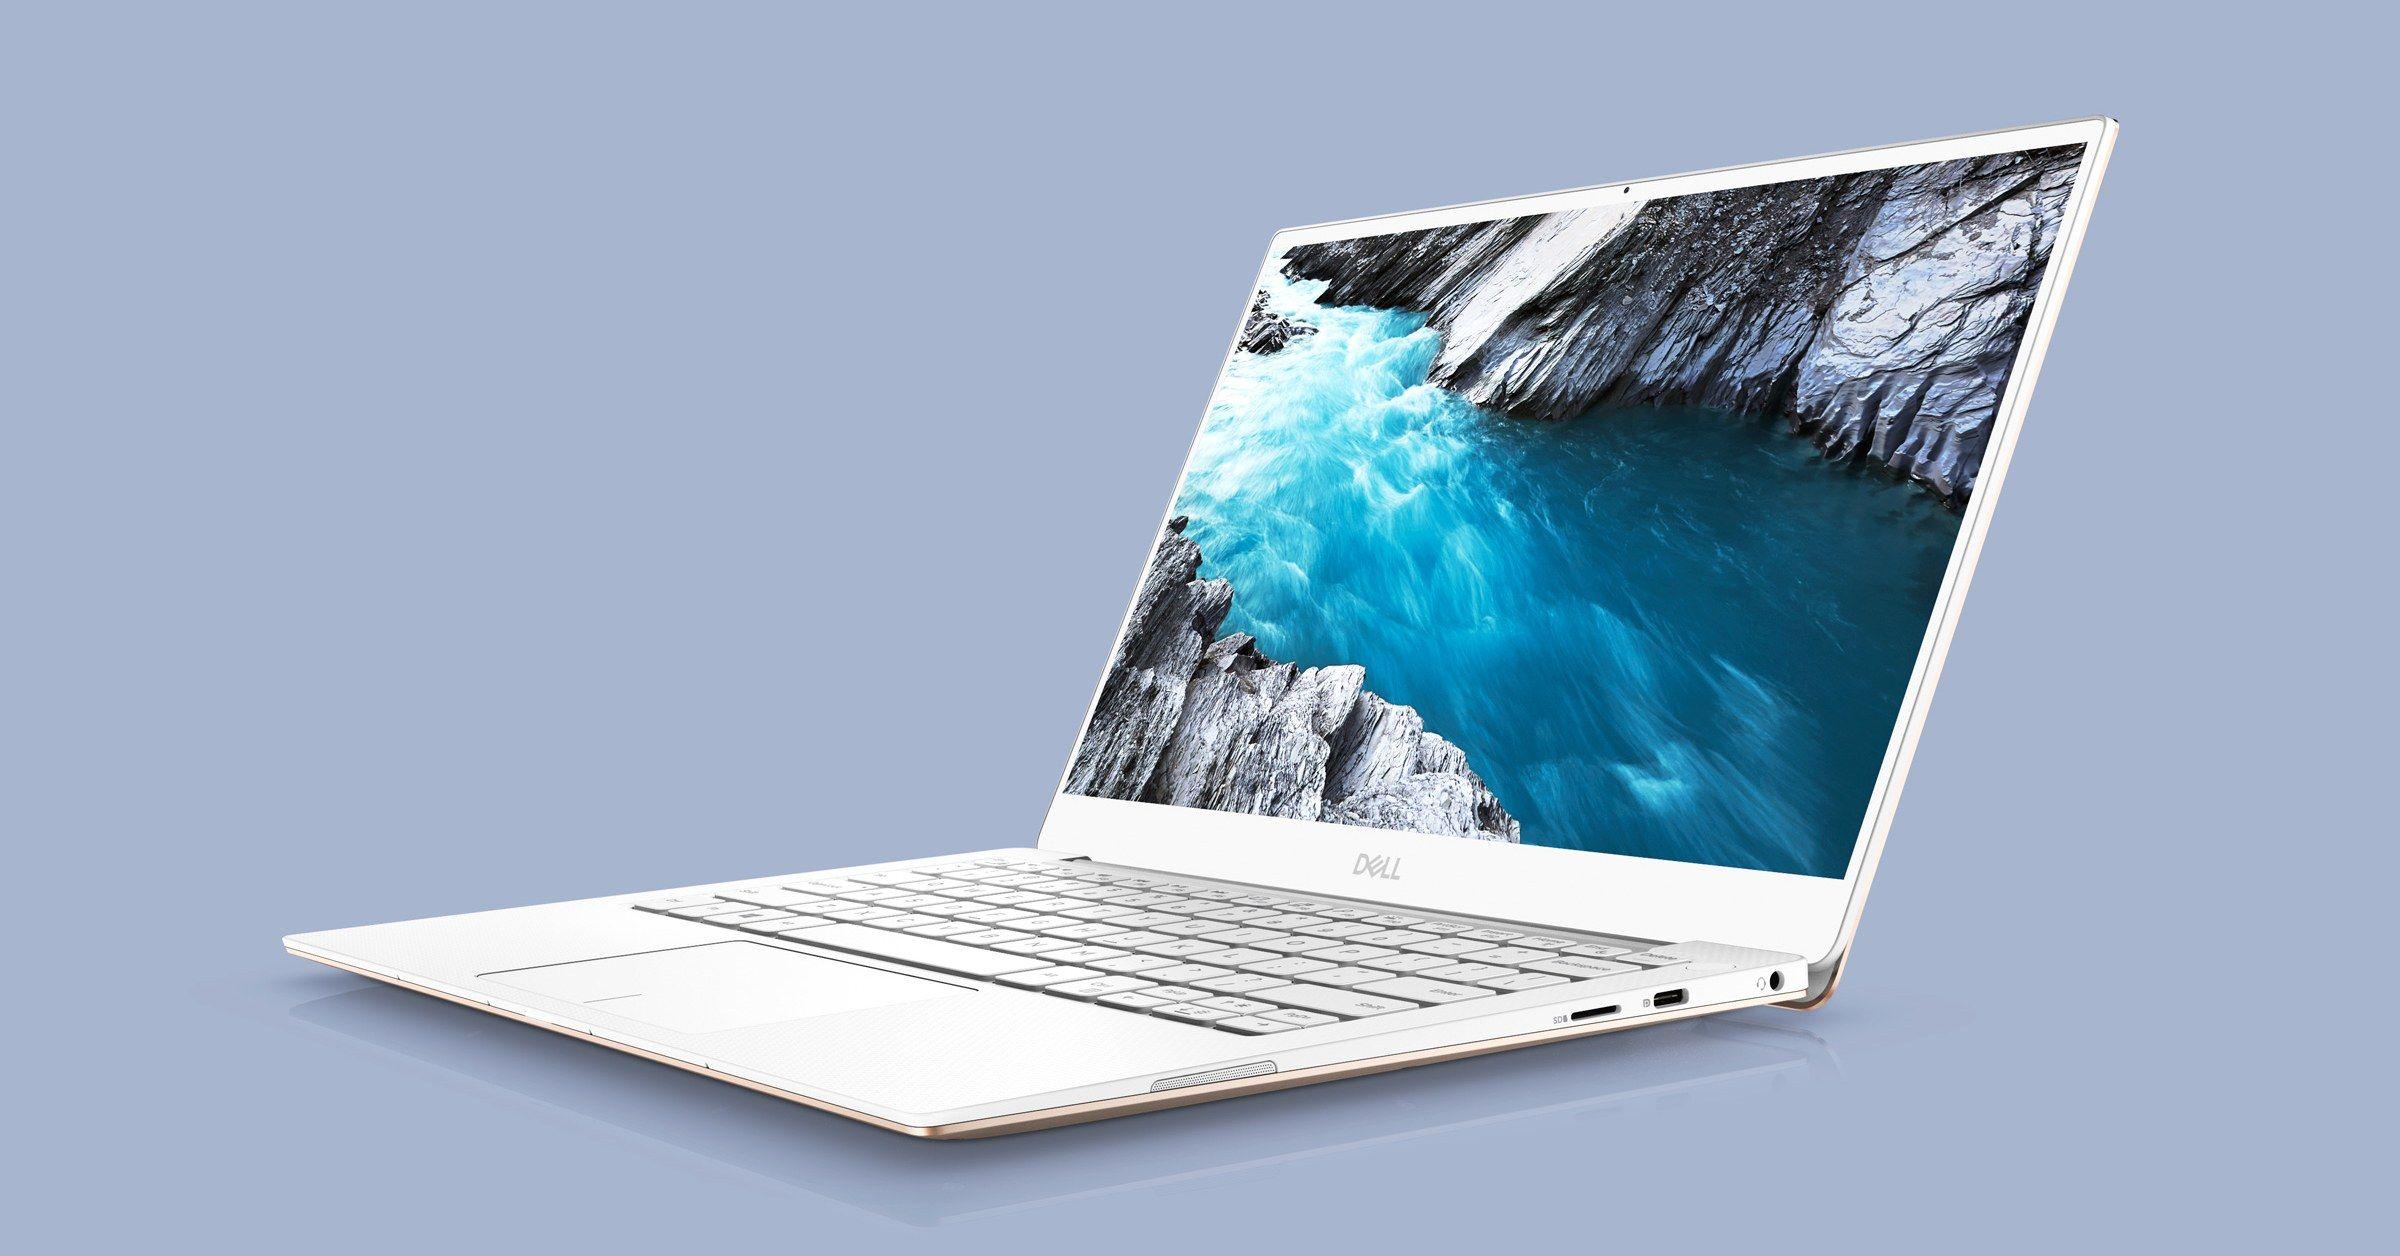 10 Best Laptops For 2019 Macbook Chromebook Windows 10